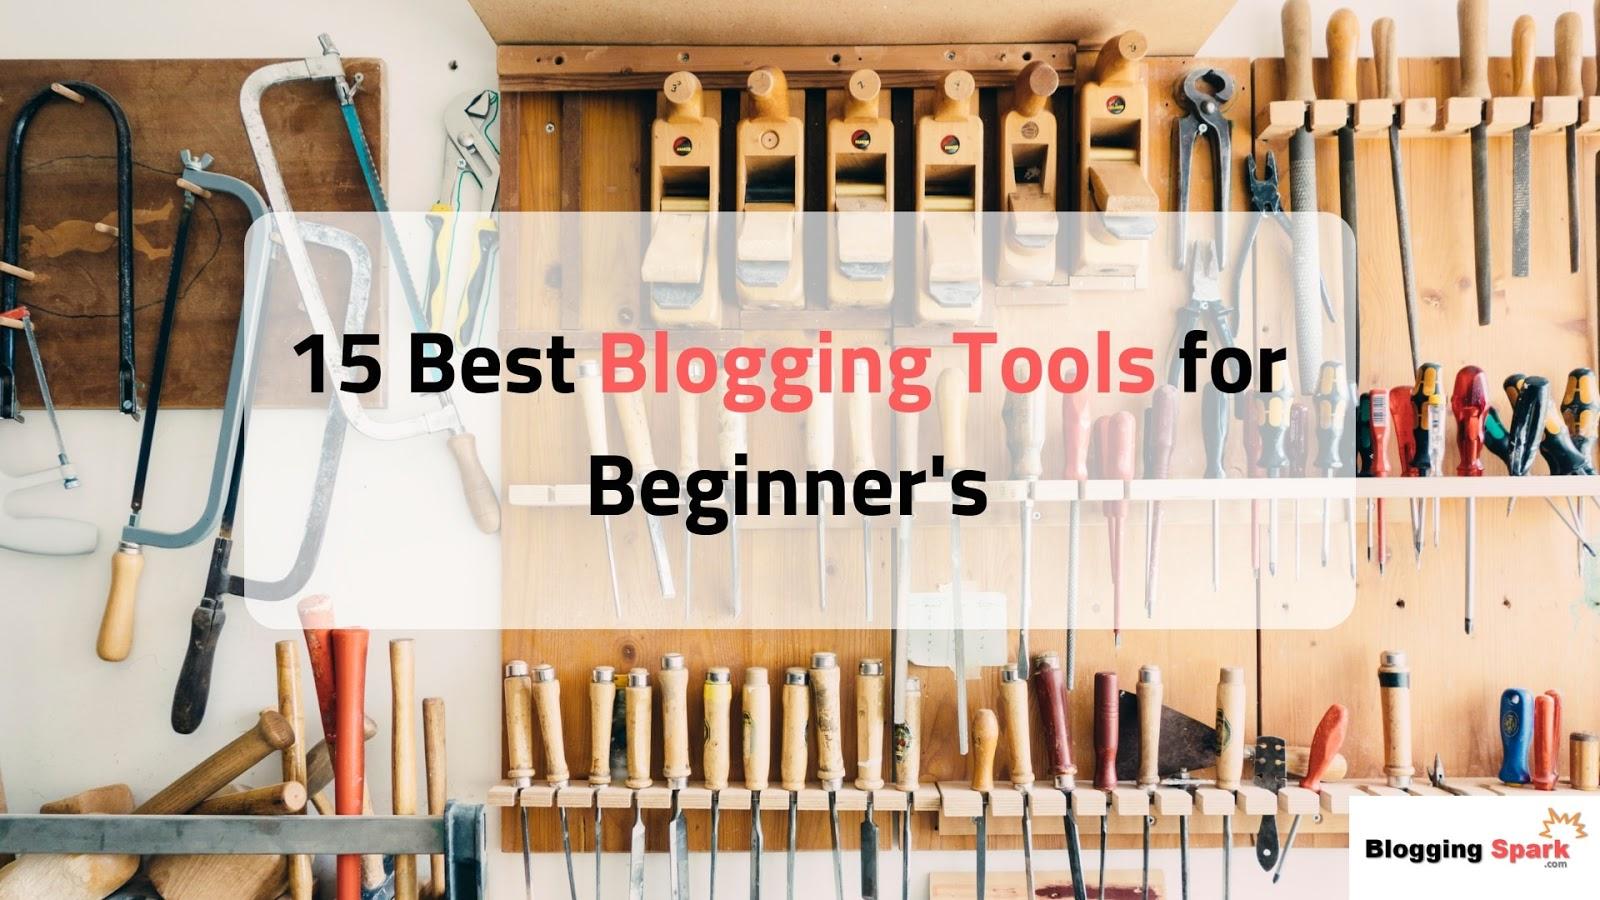 best blogging tools for beginner's